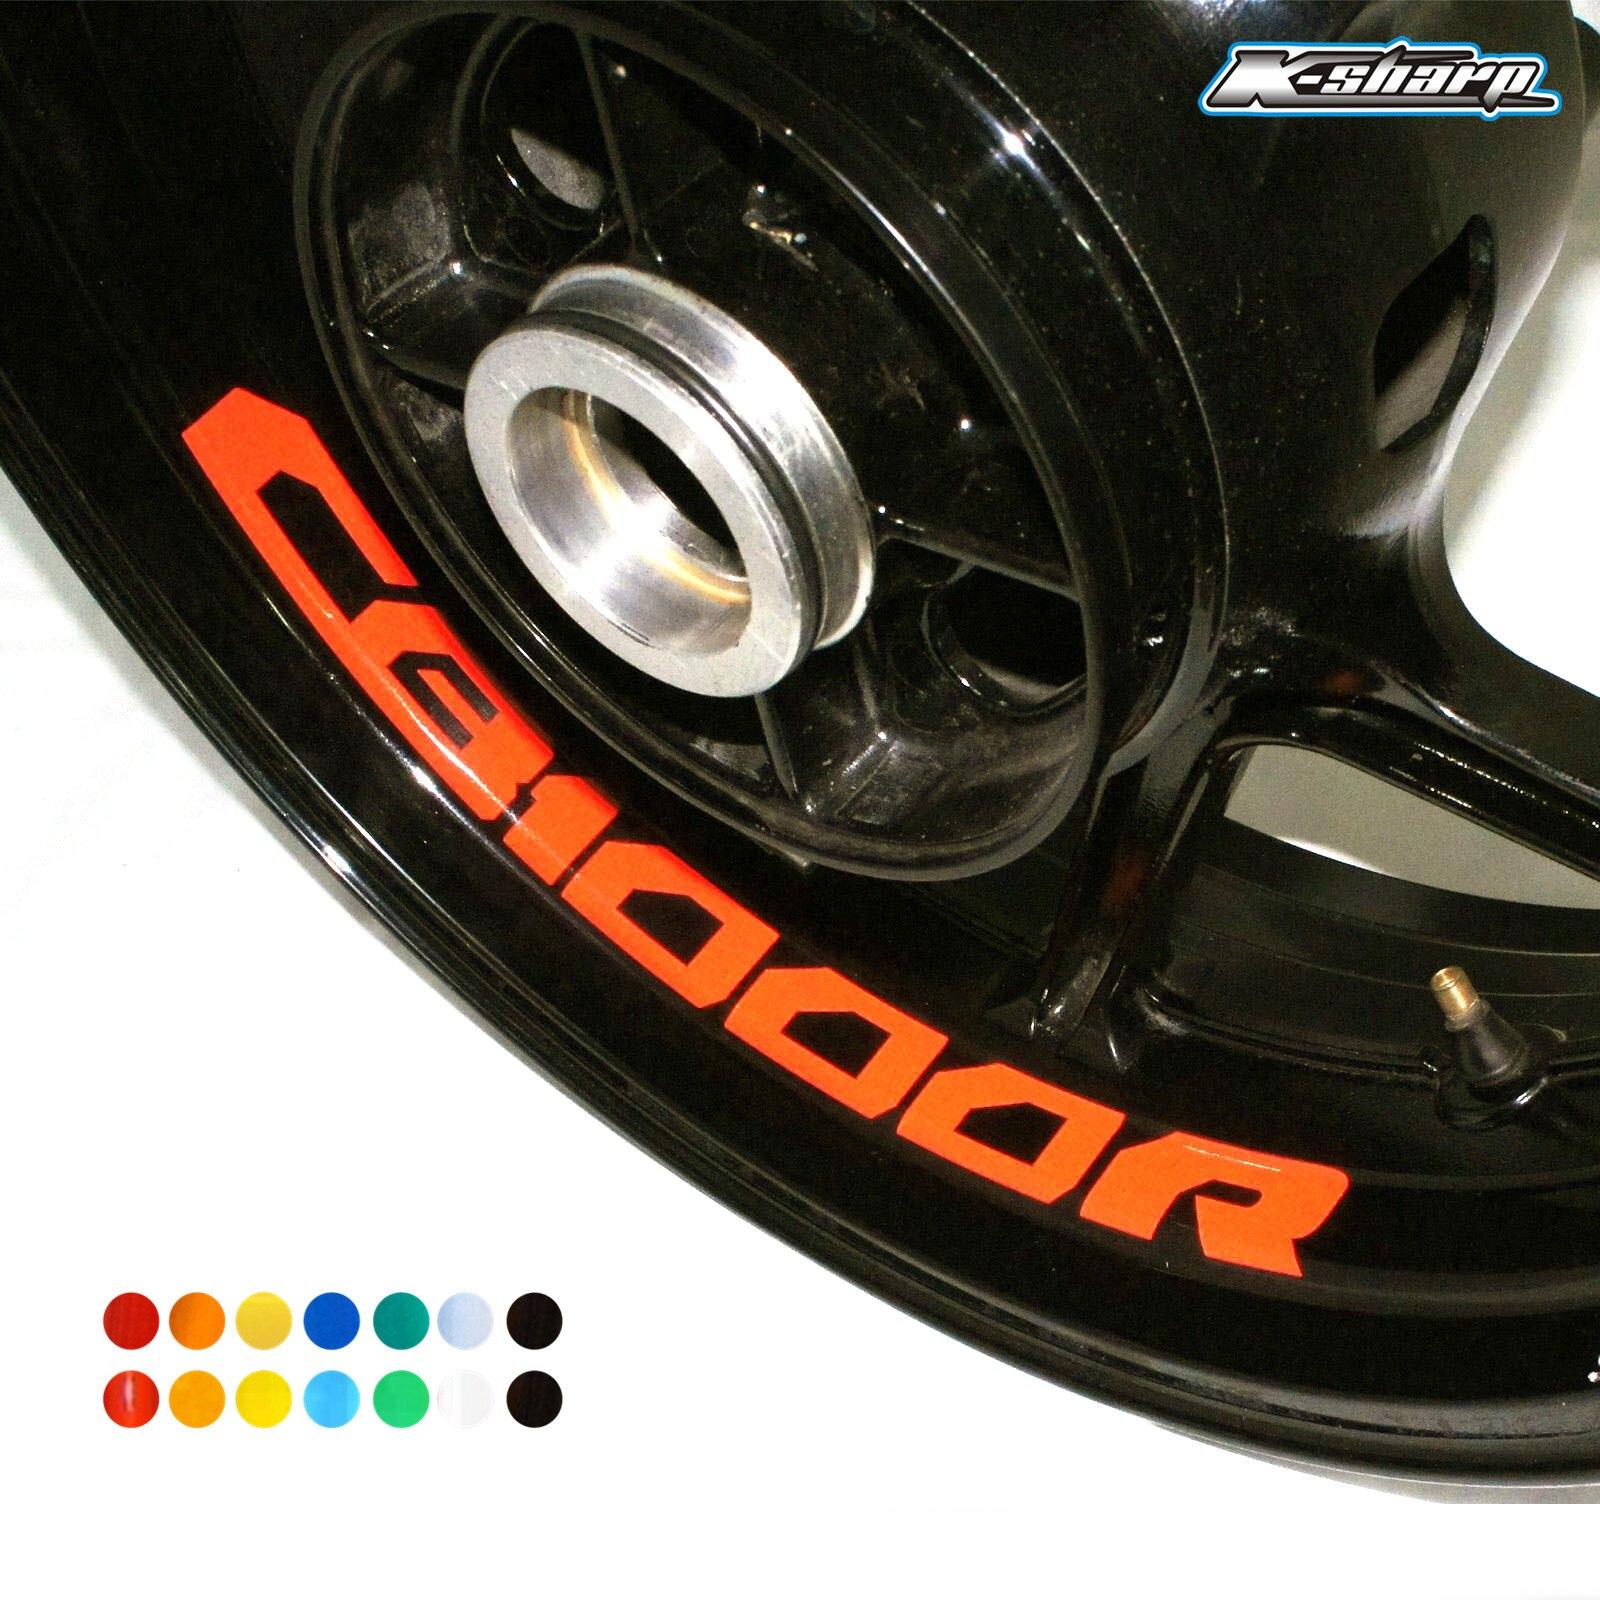 8 X Custon Inner Rim Decals Wheel Reflective Stickers Stripes FIT HONDA CB1000R